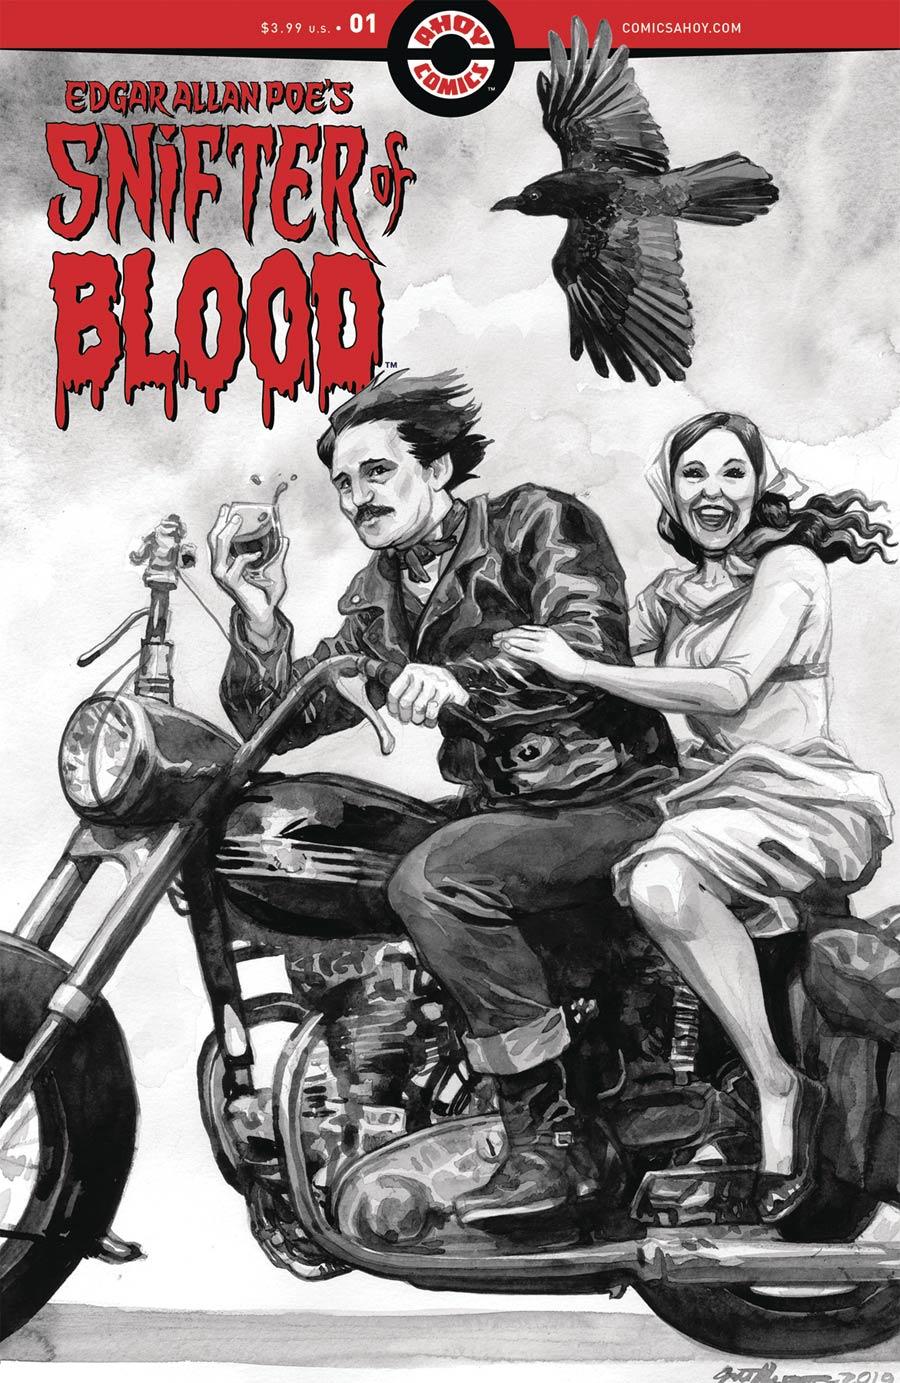 Edgar Allan Poes Snifter Of Blood #1